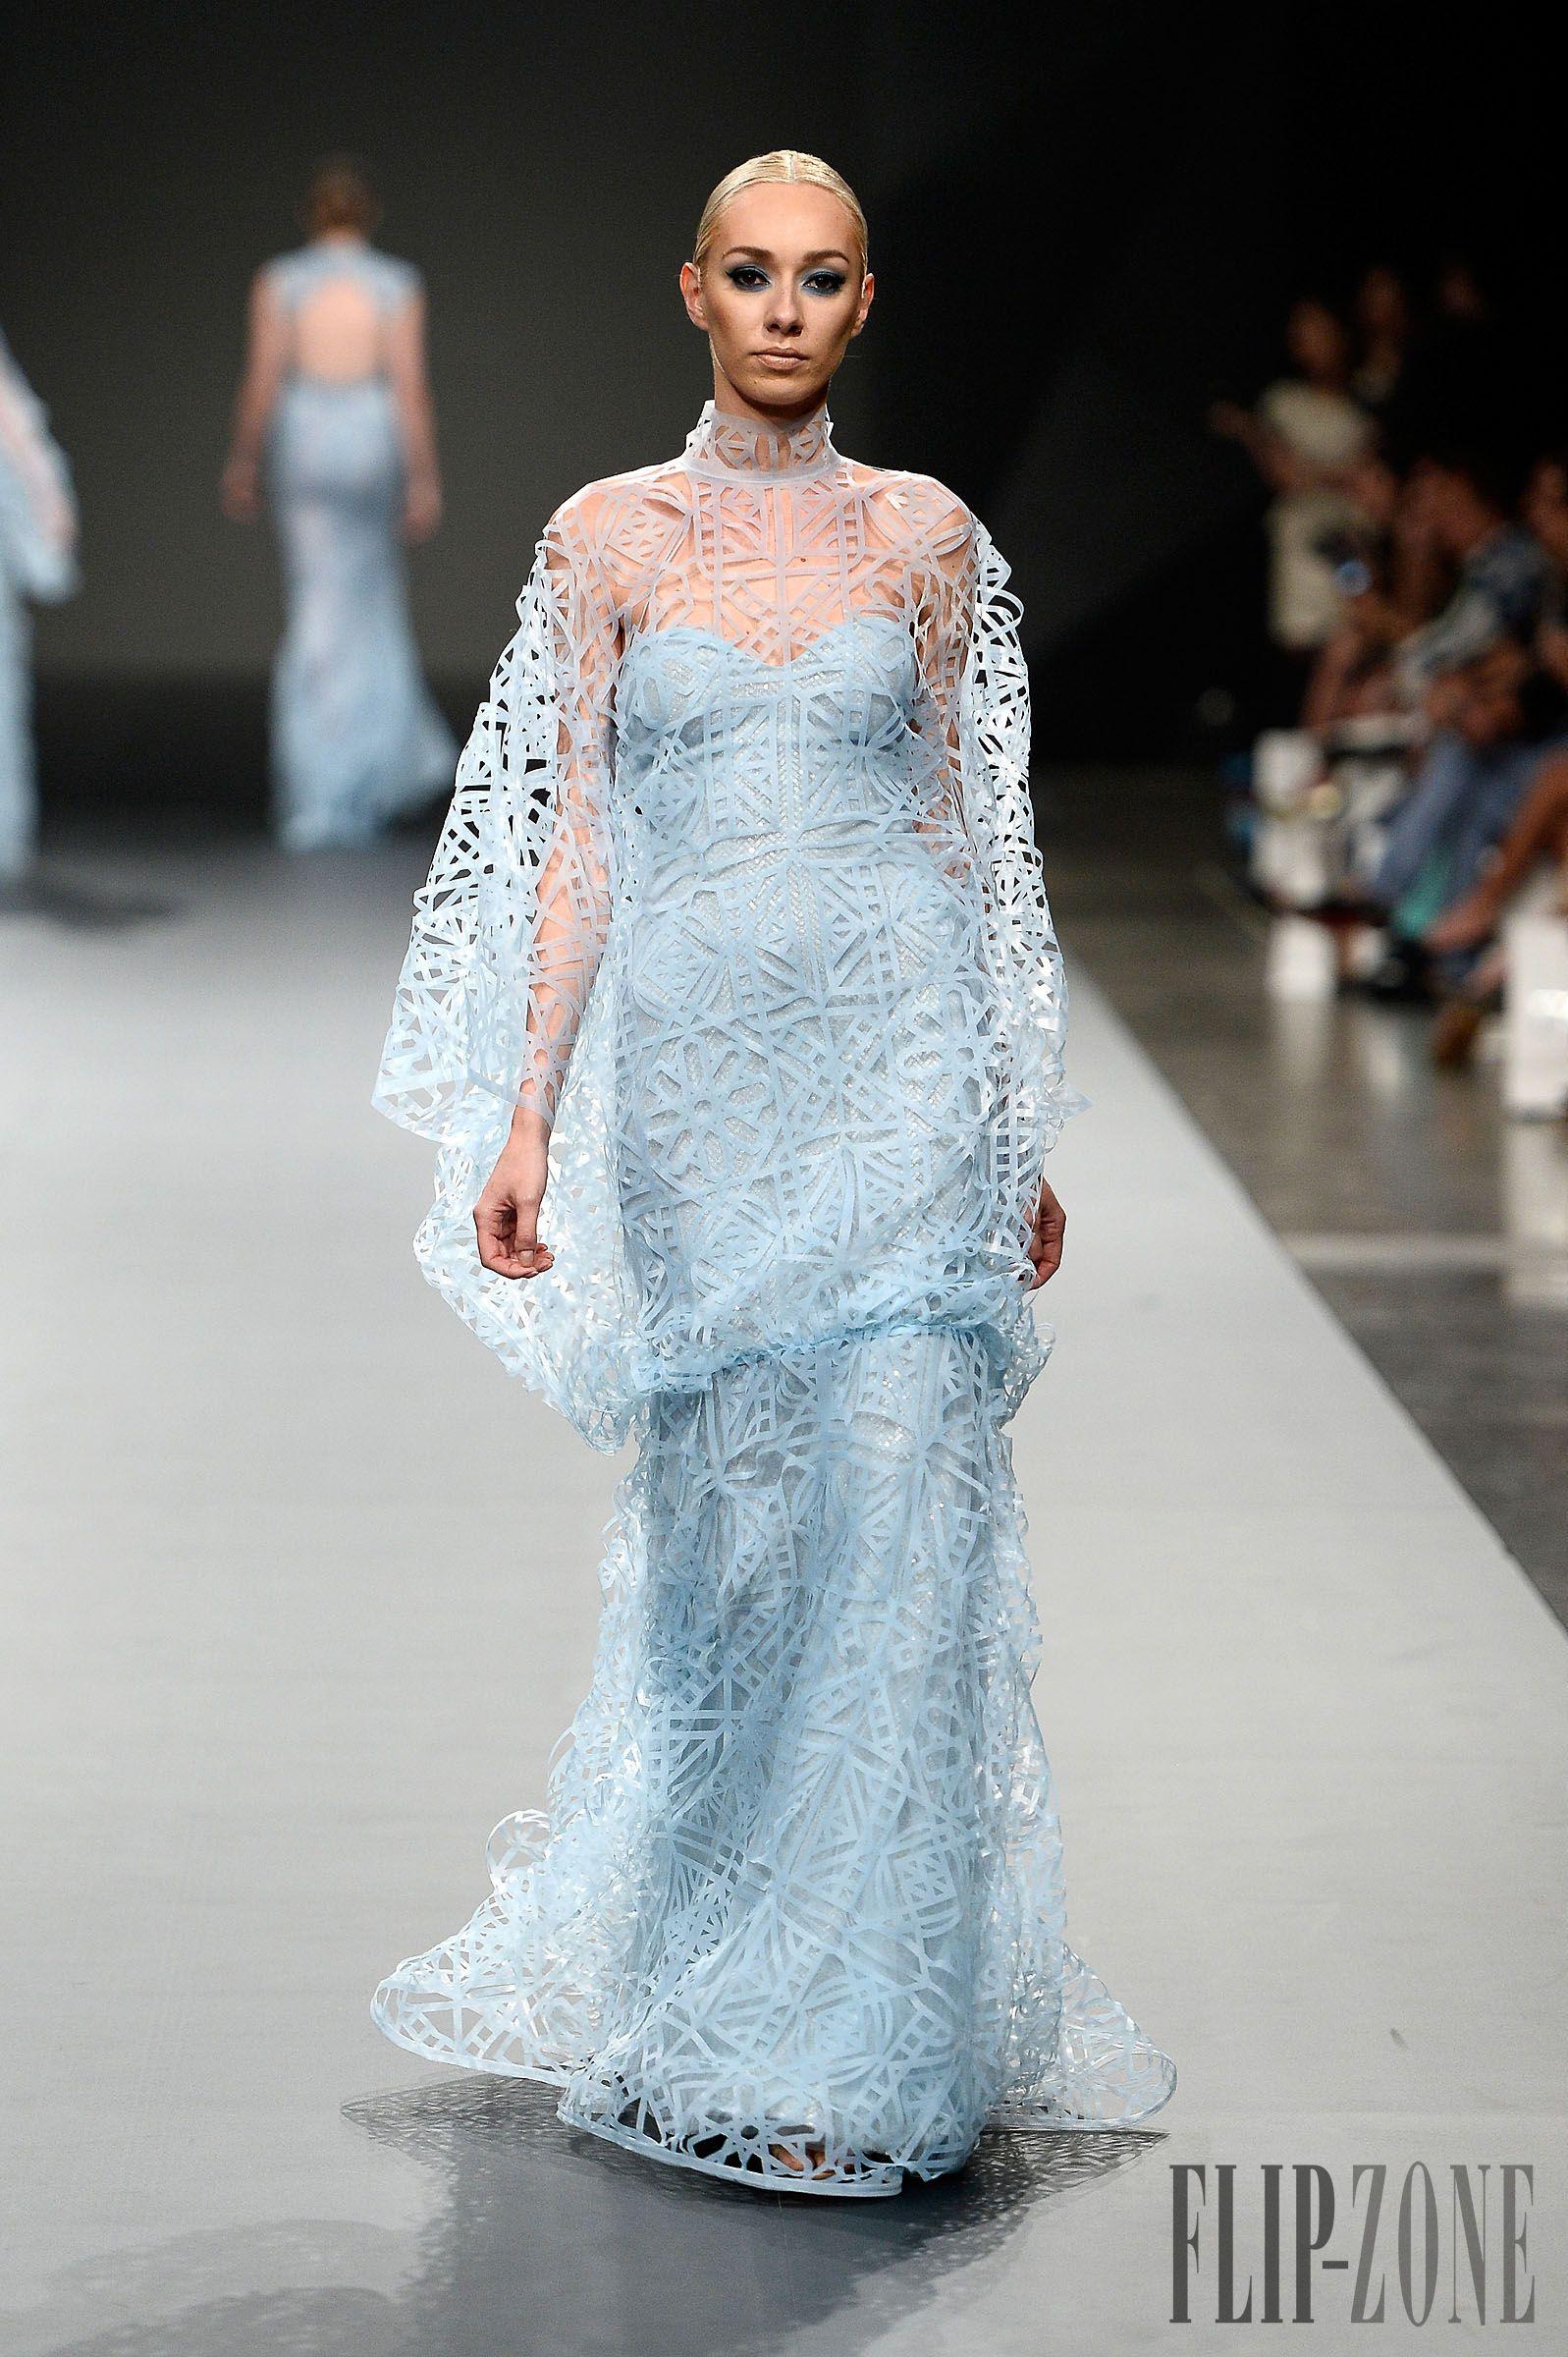 Ezra Spring-summer 2014 - Couture - http://www.flip-zone.com/ezra ...